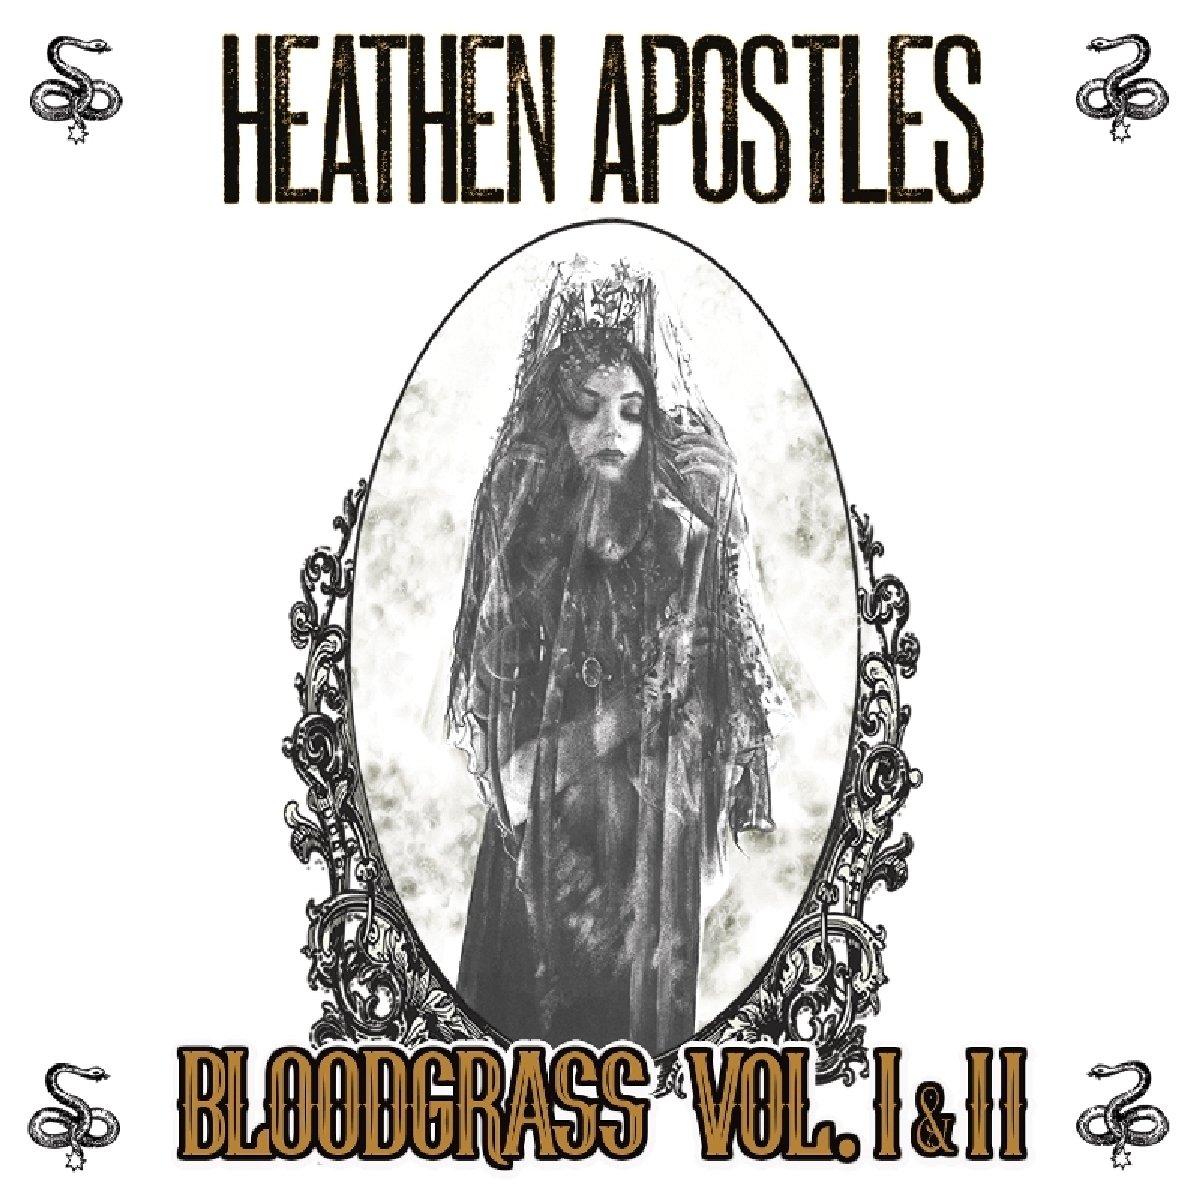 Vinilo : Heathen Apostles - Bloodgrass I&ii (LP Vinyl)